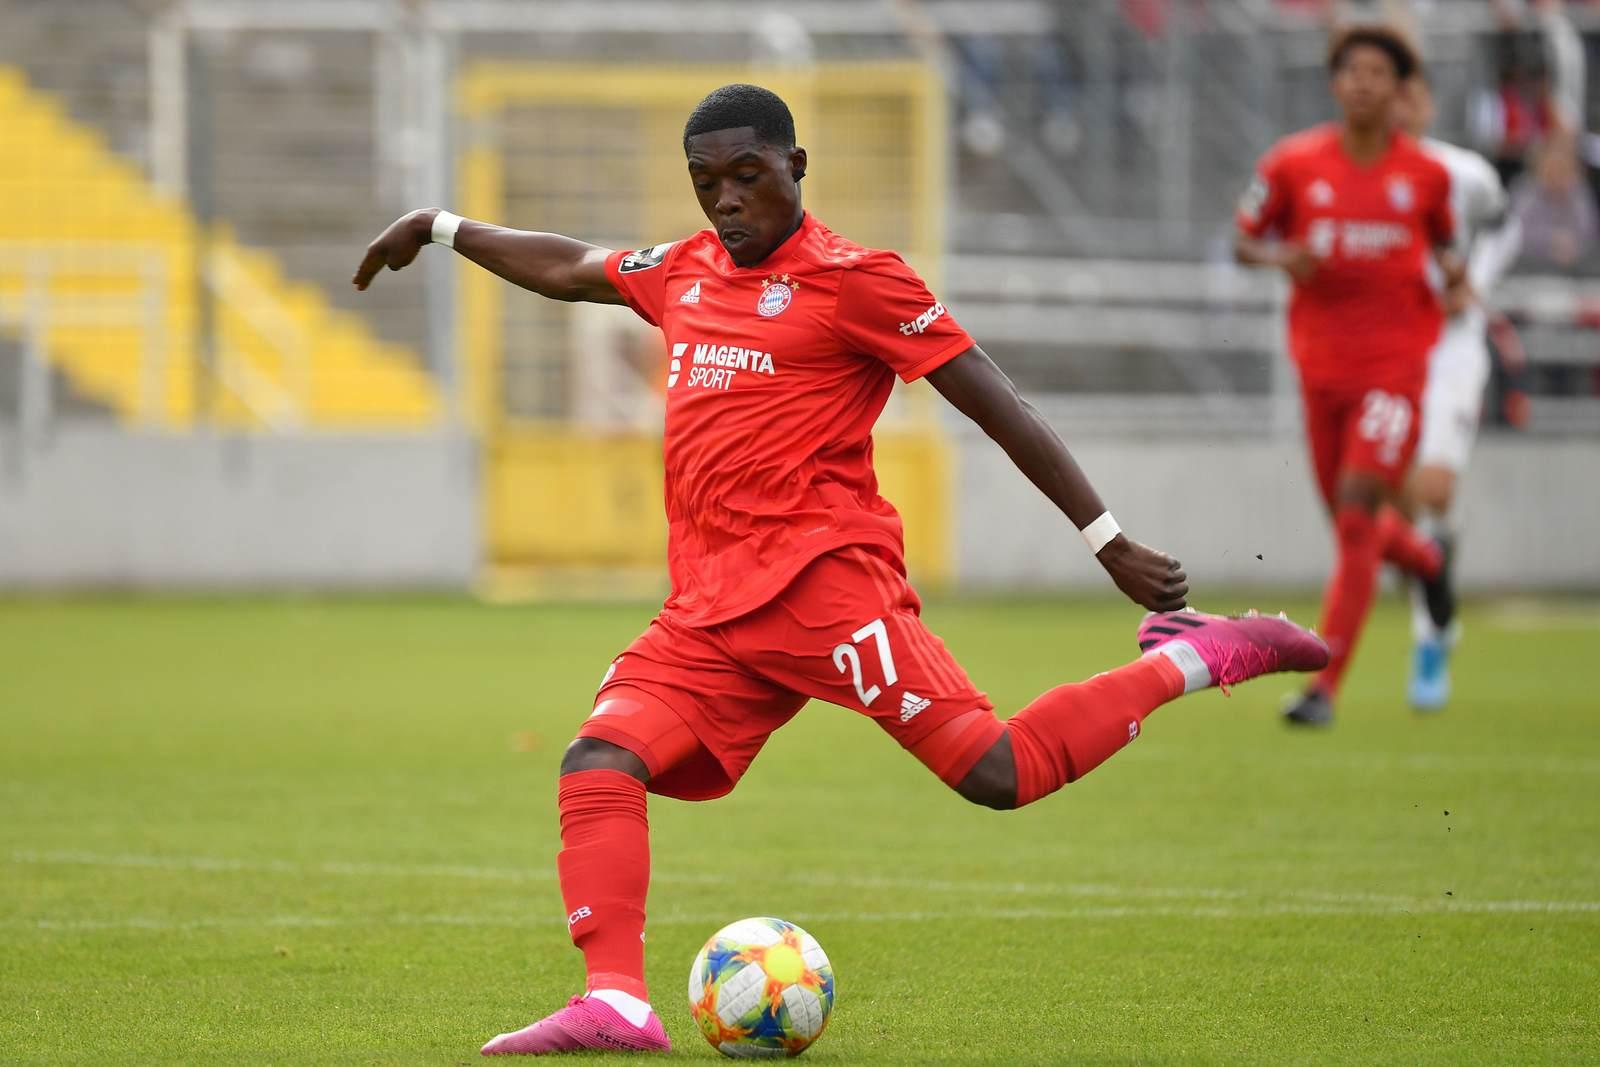 Derrick Köhn bei der FC Bayern U23